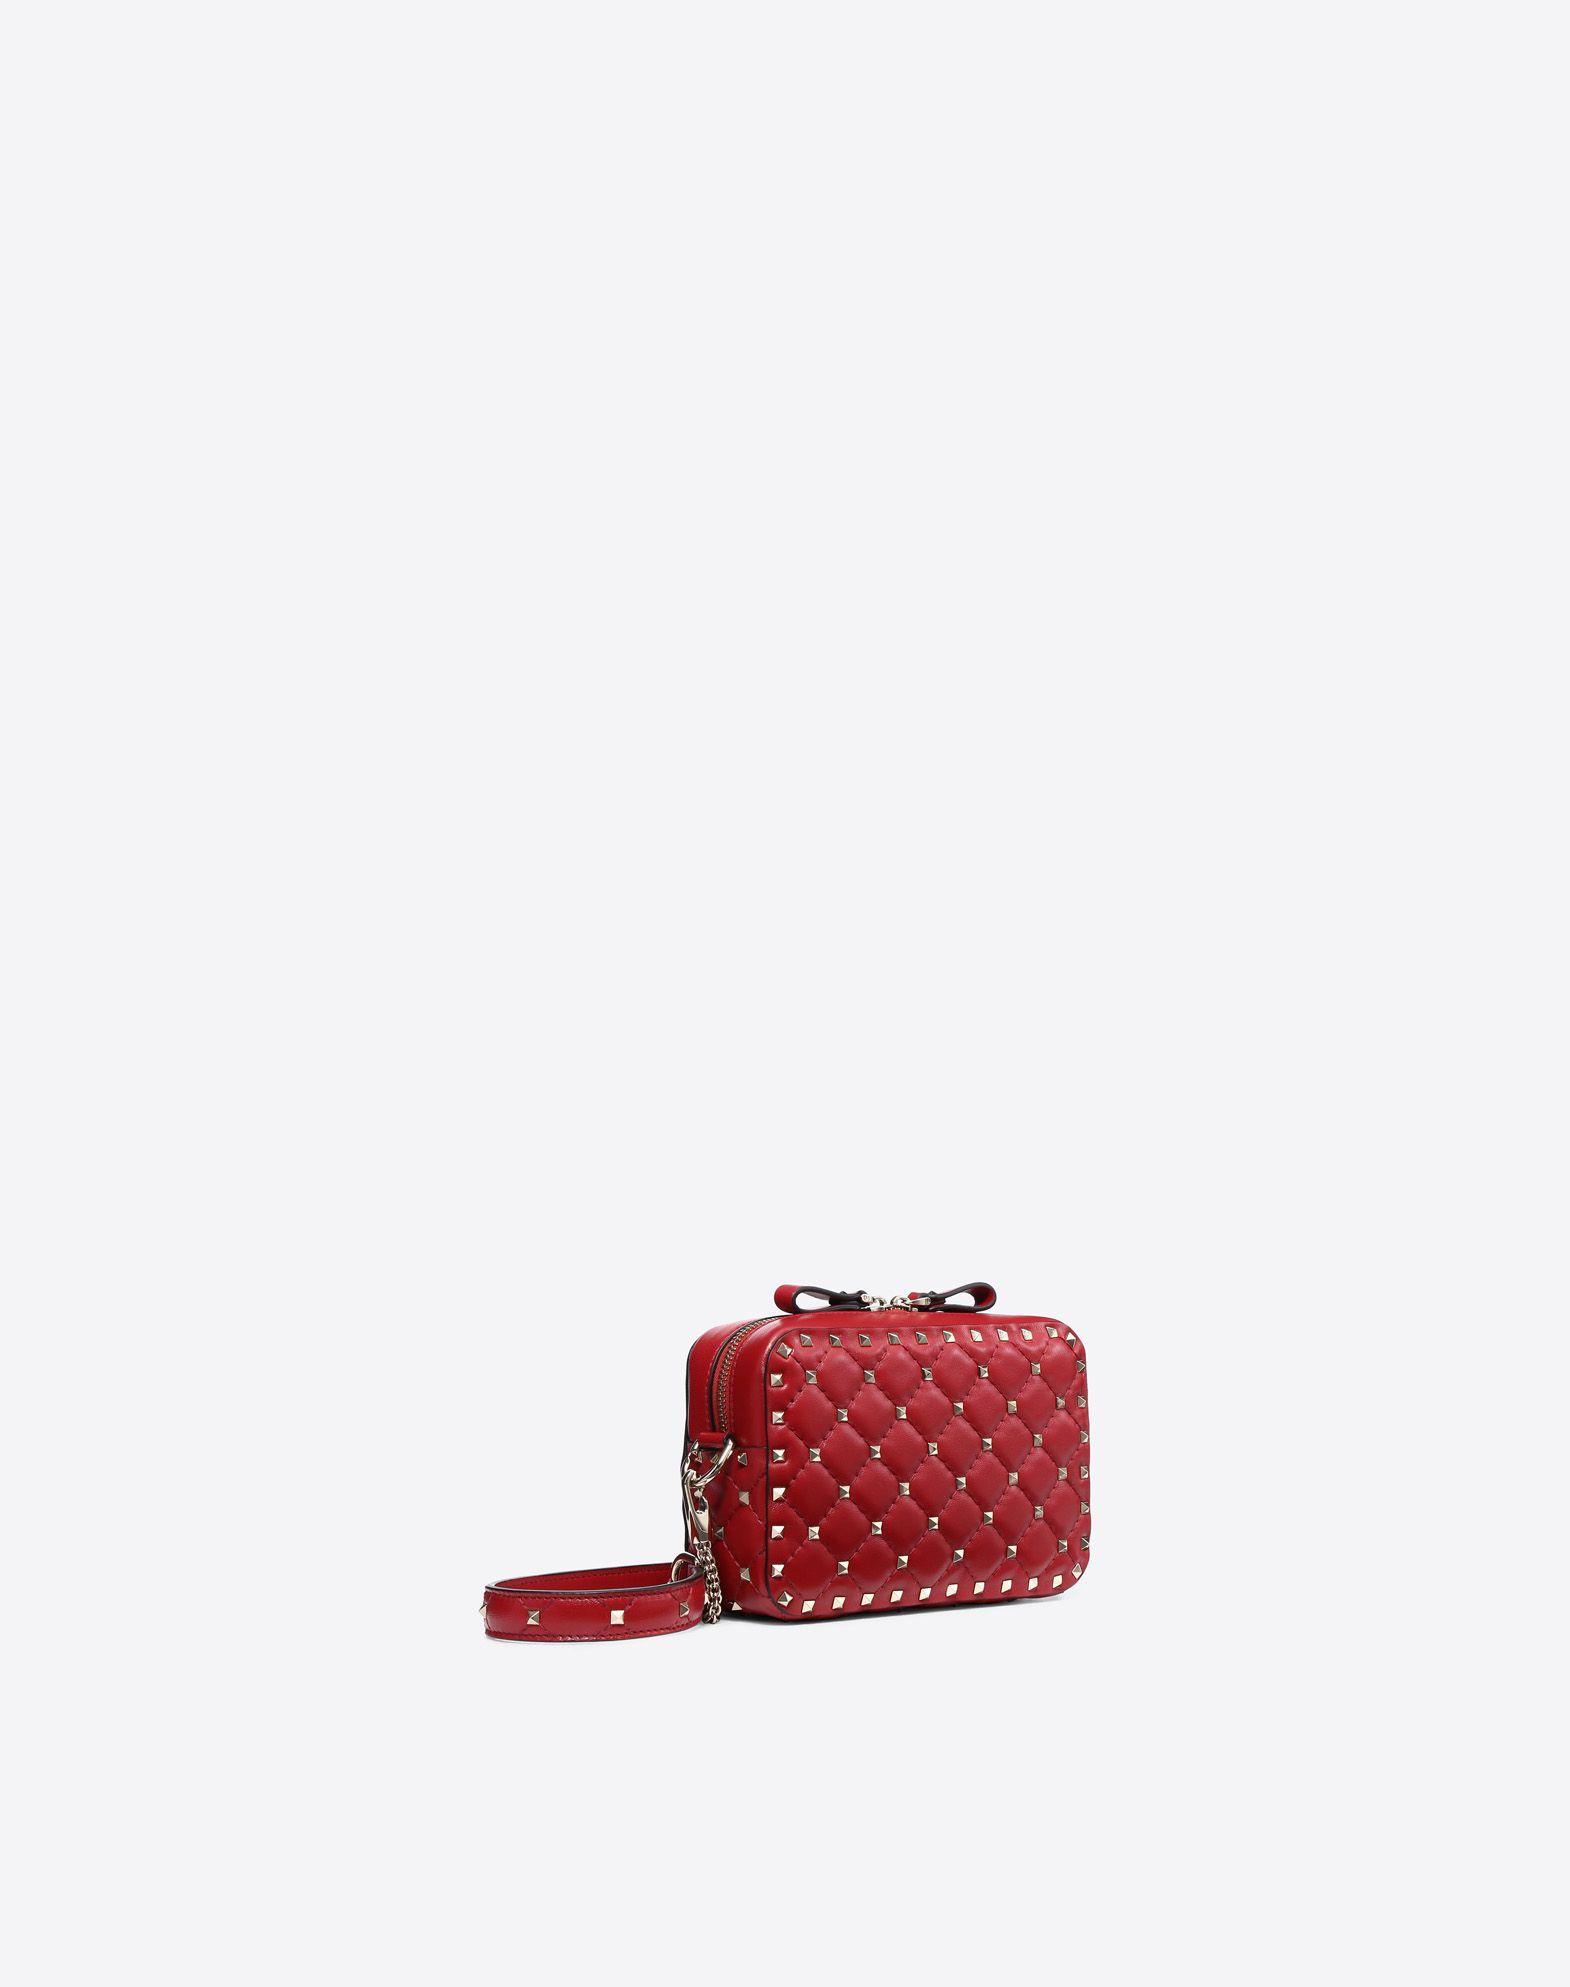 VALENTINO GARAVANI Rockstud Spike Cross Body Bag CROSS BODY BAG D r